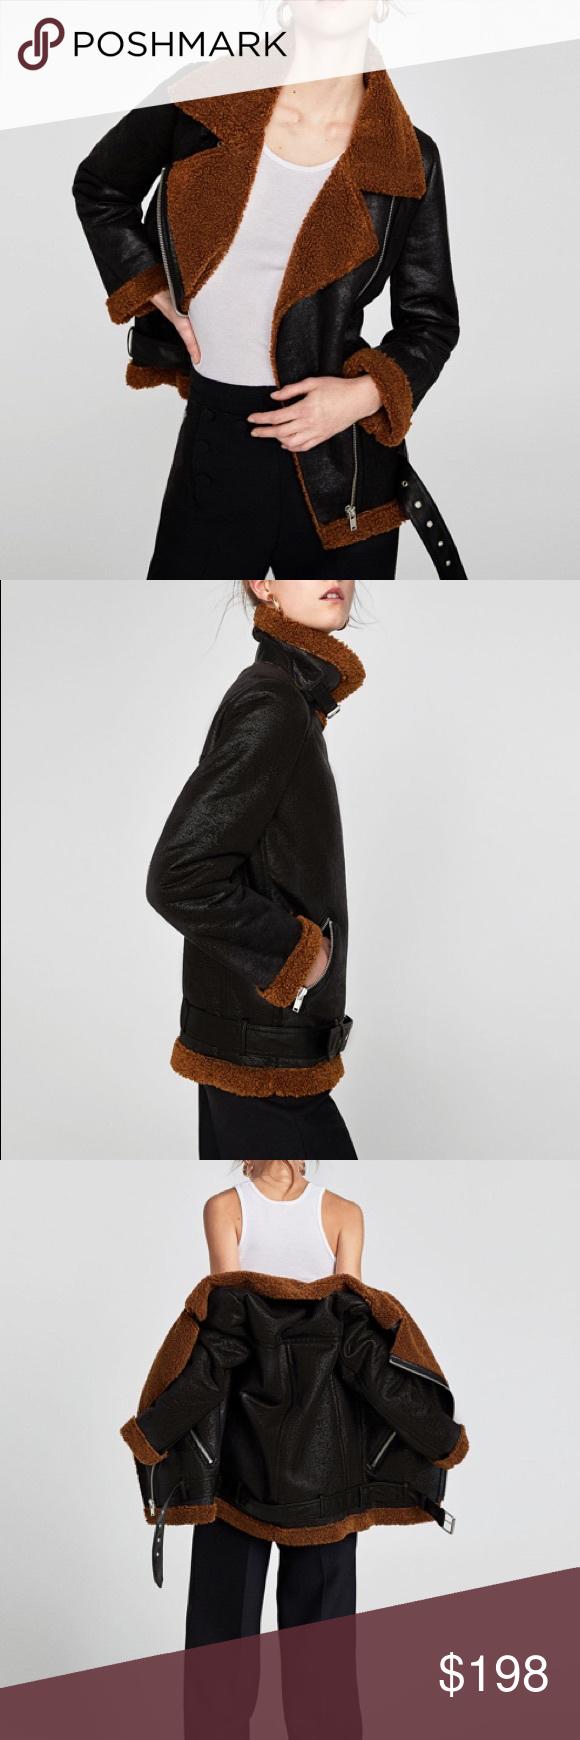 Zara Textured Biker Jacket Black Moto Jacket Zara black